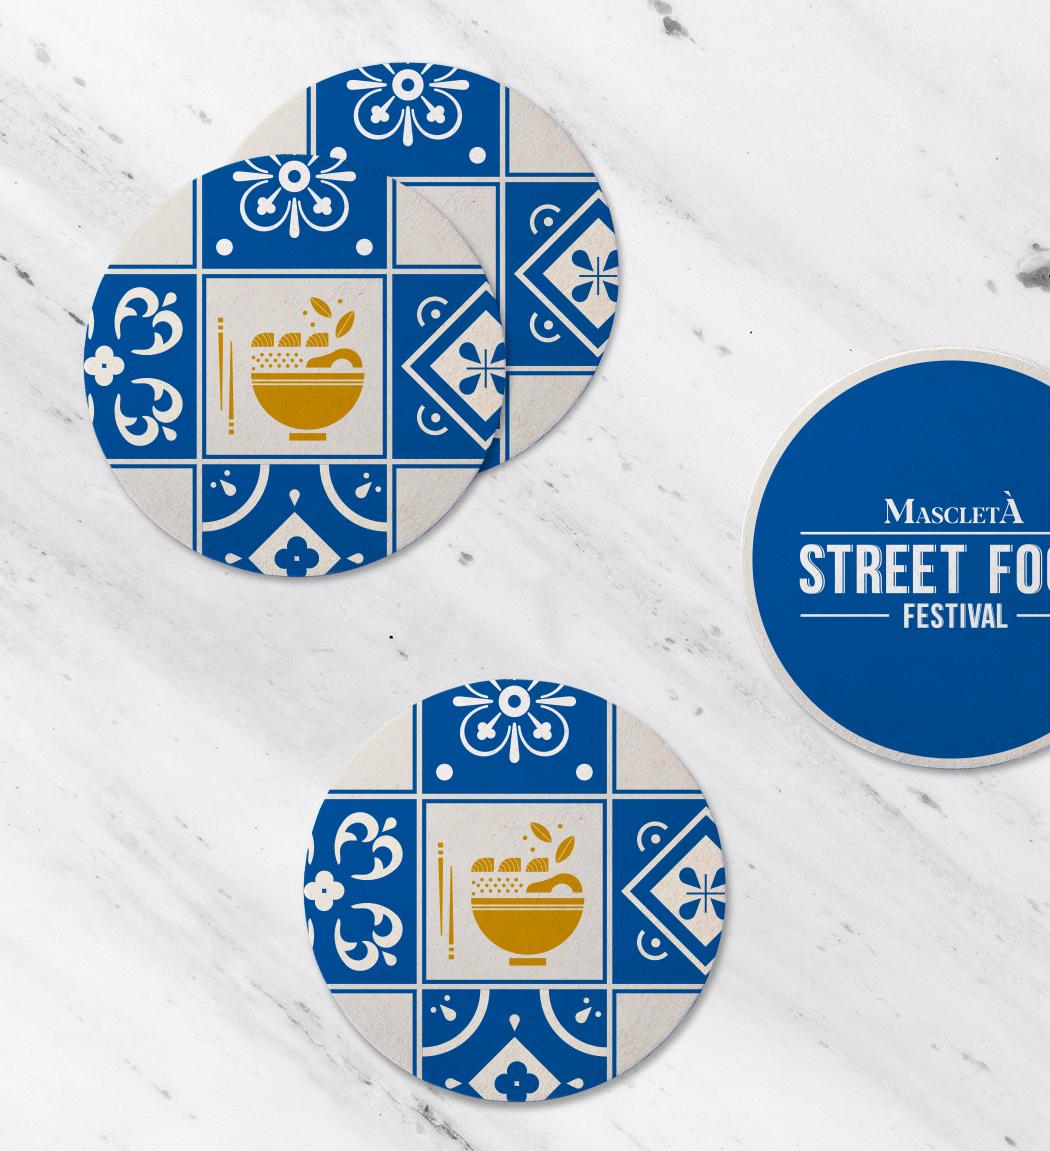 Mascletà Street Food Festival visual identity design by Gelpi Design